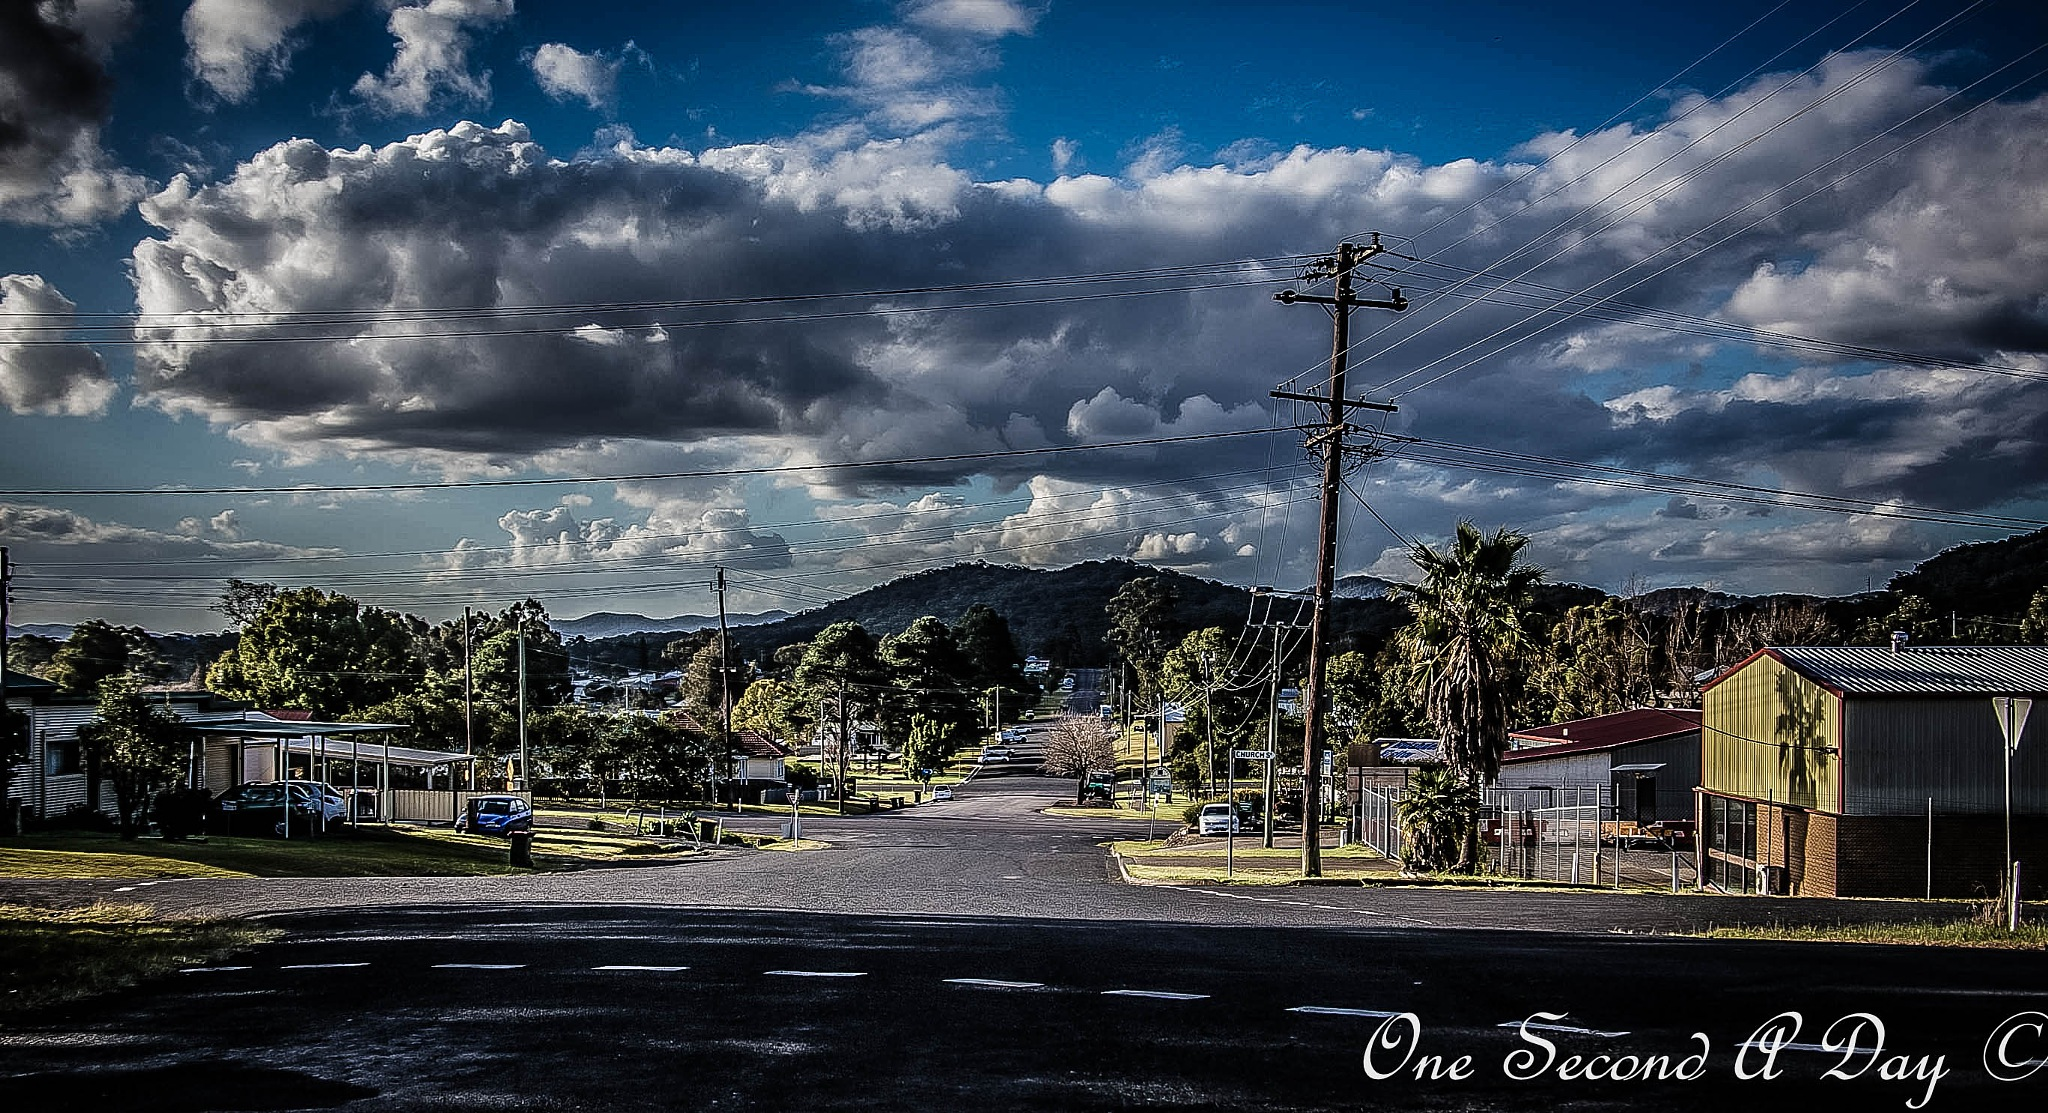 Street View by Daz Laughton